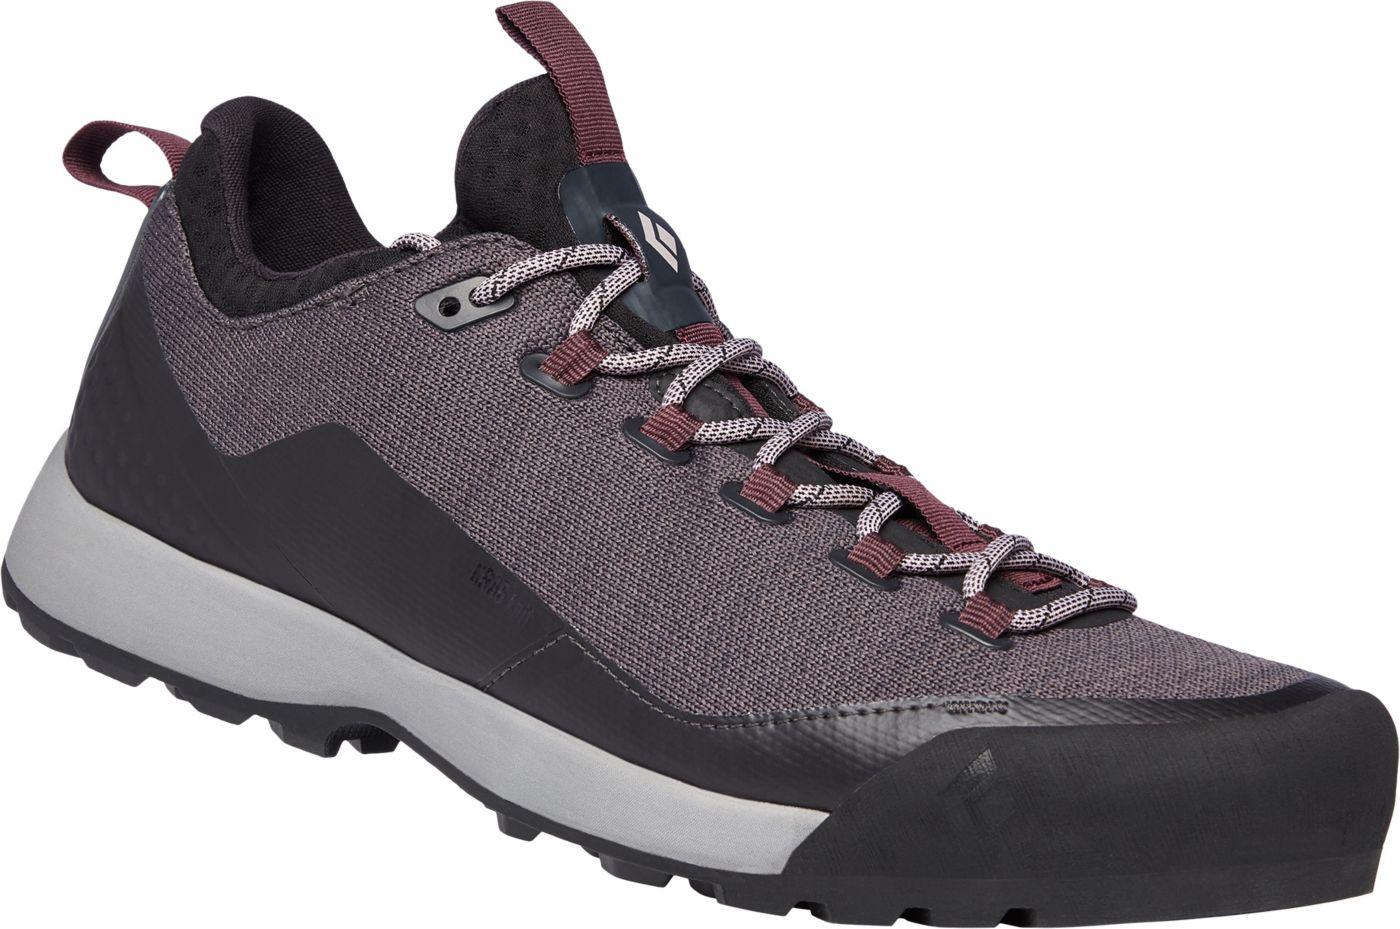 Black Diamond Women's Mission LT Approach Climbing Shoes